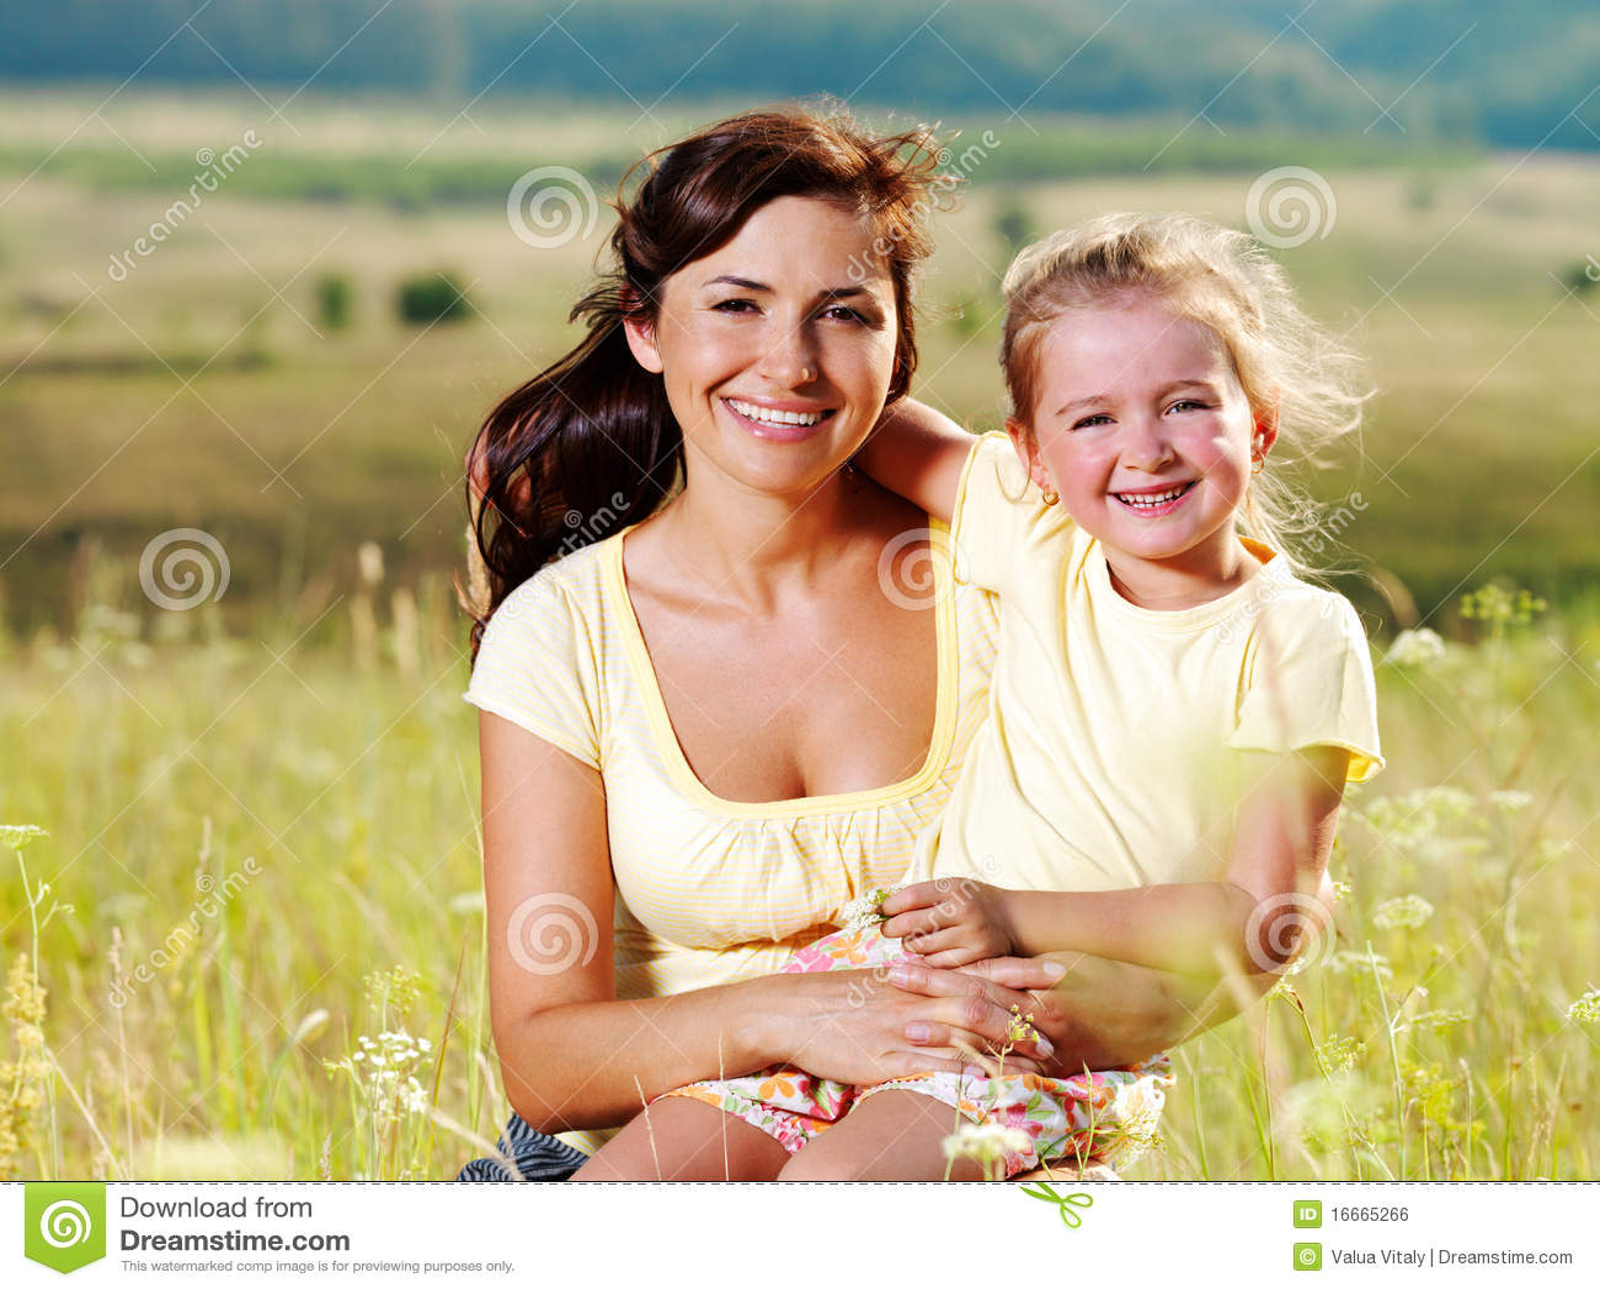 golaya-mama-na-prirode